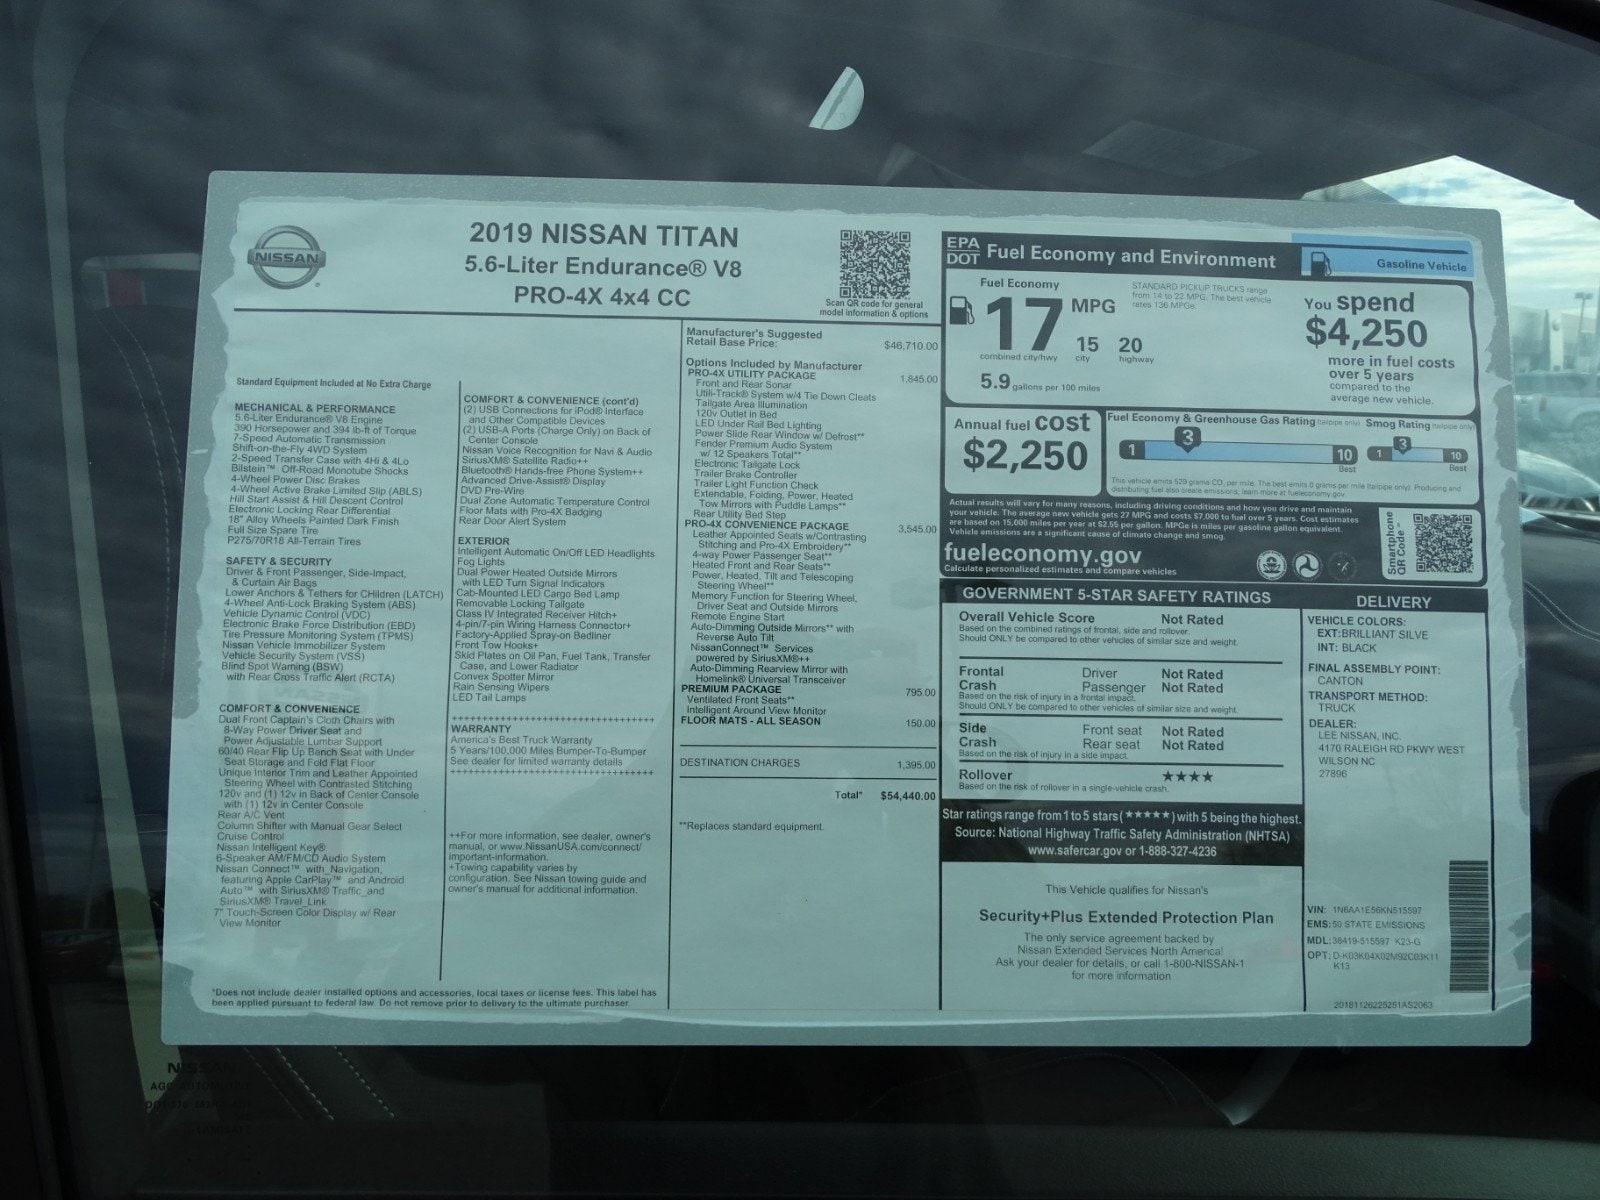 New 2019 Nissan Titan PRO-4X For Sale in Wilson, NC   Near